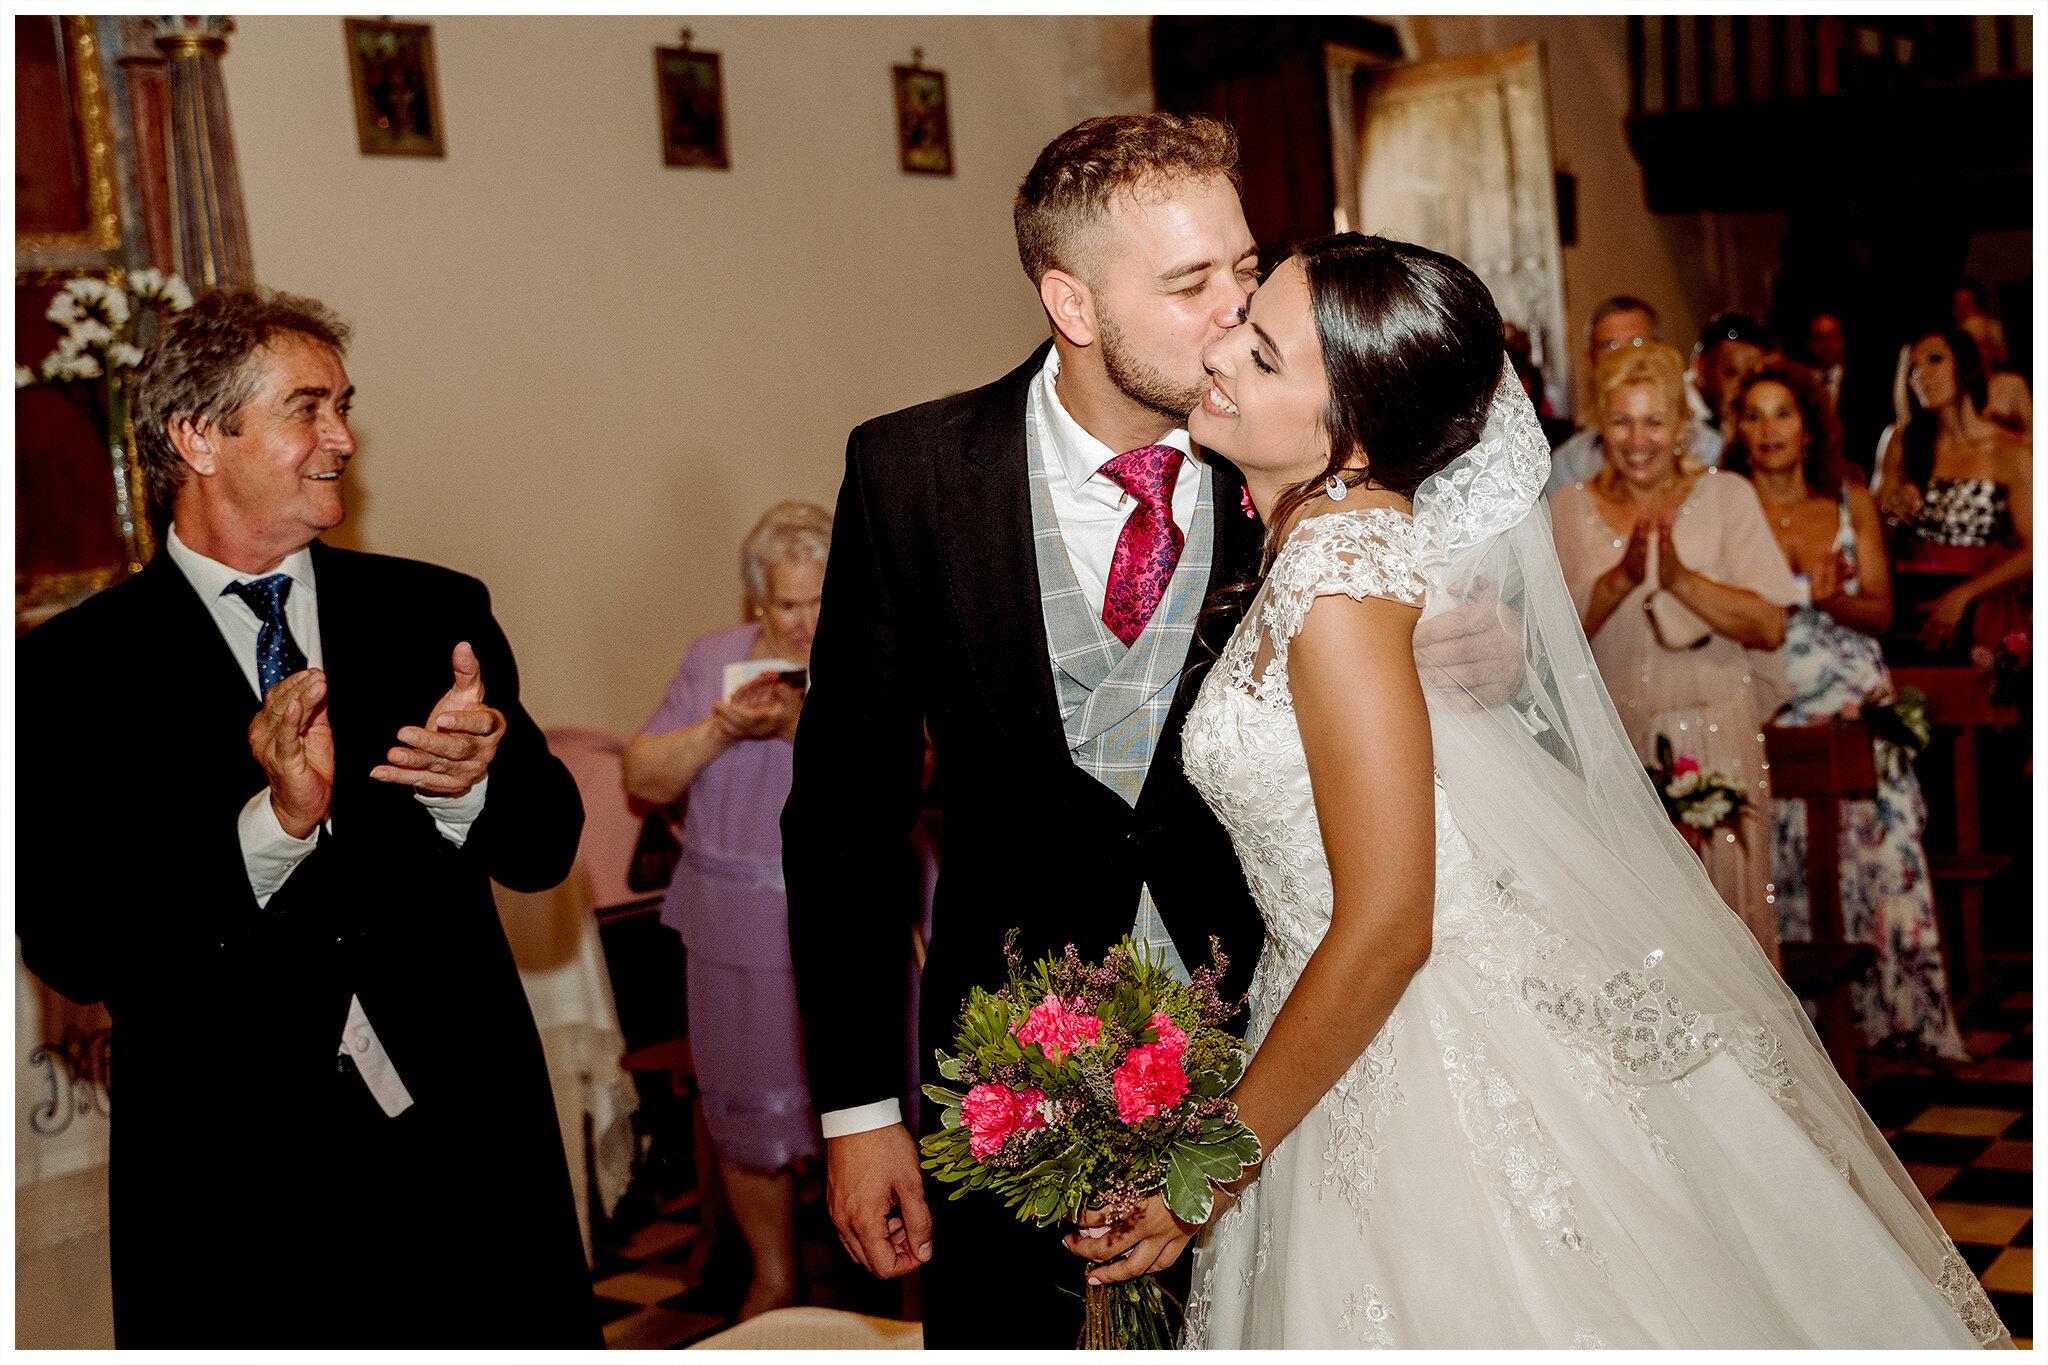 dreamsanddreamers.com-o-nunta-frumoasa-32.jpg